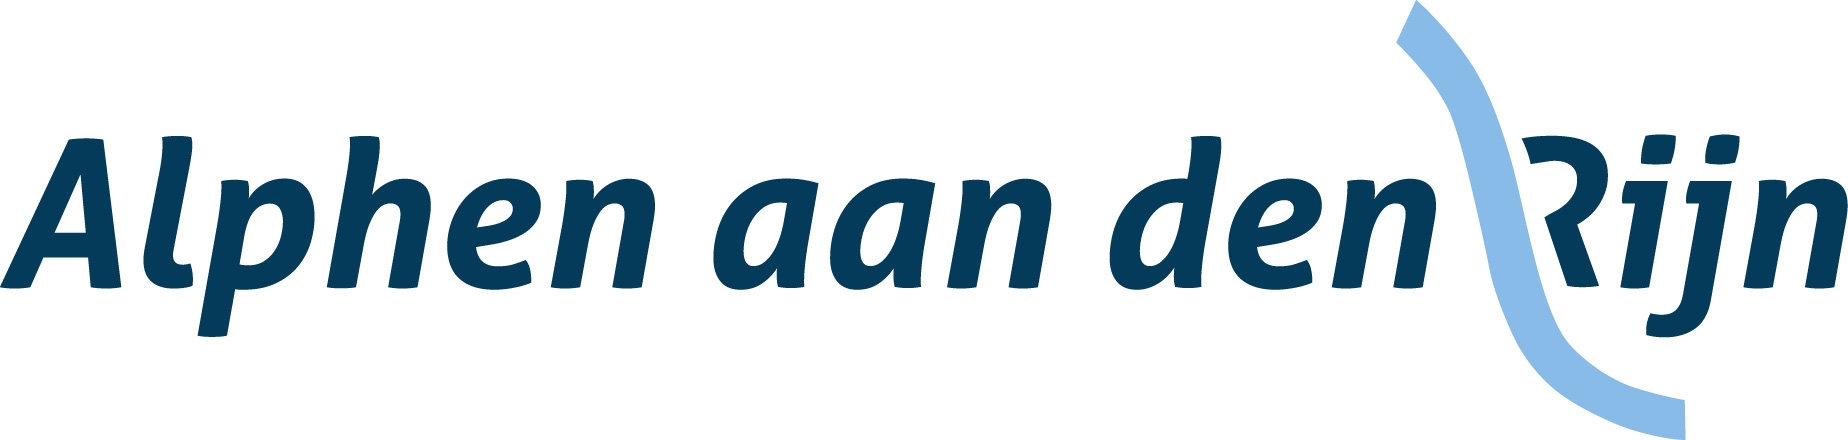 logo_alphenaandenrijn_abr_2014.jpg